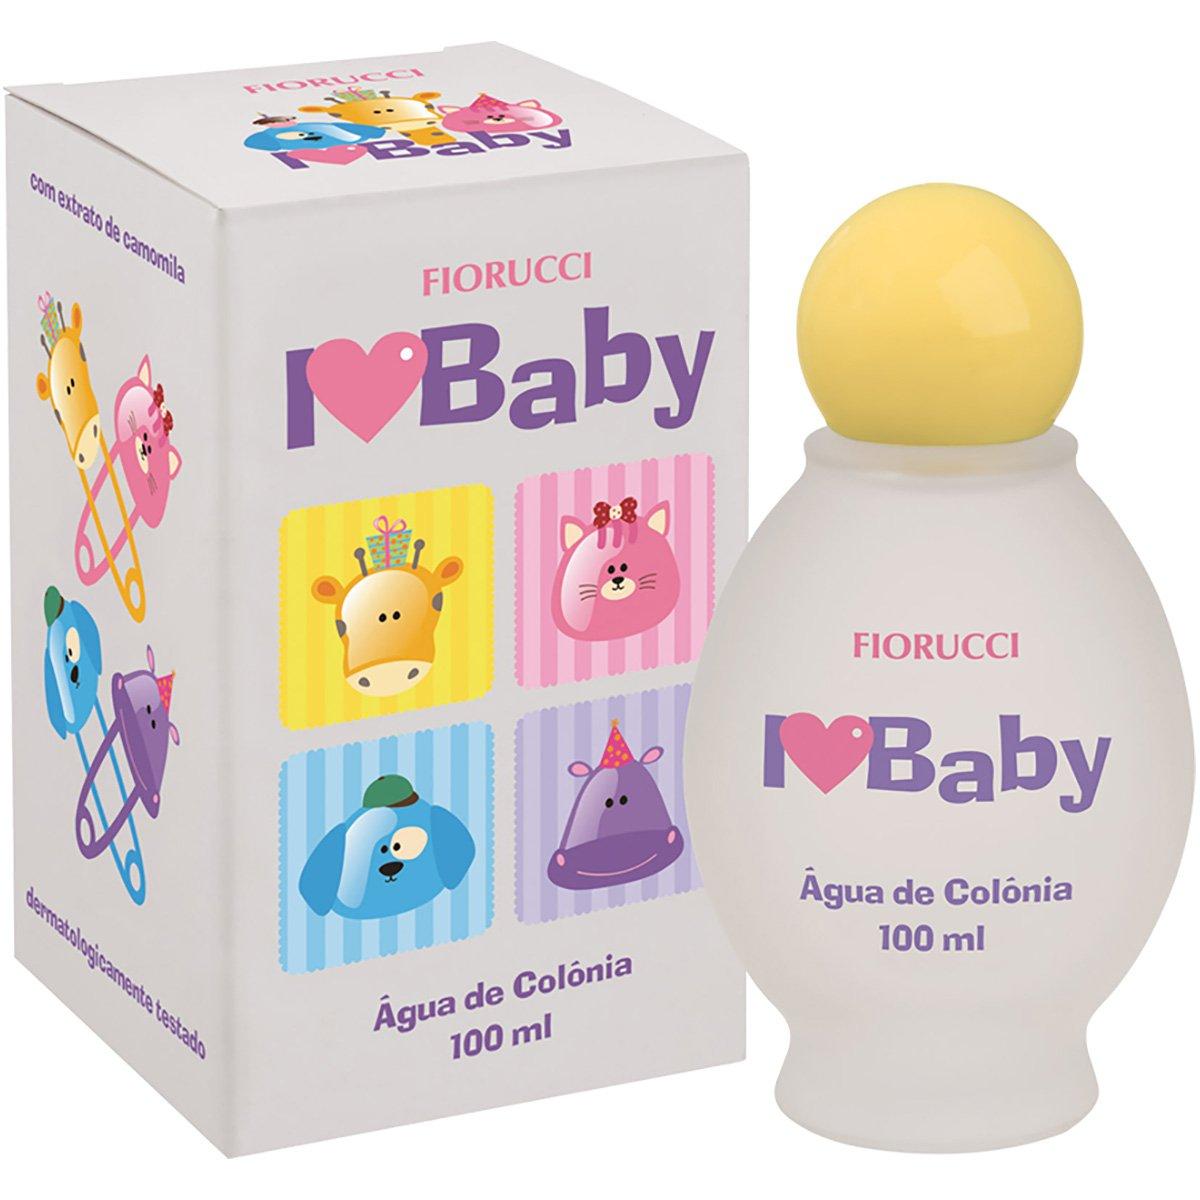 Água de Colônia Fiorucci Love Baby 100ml